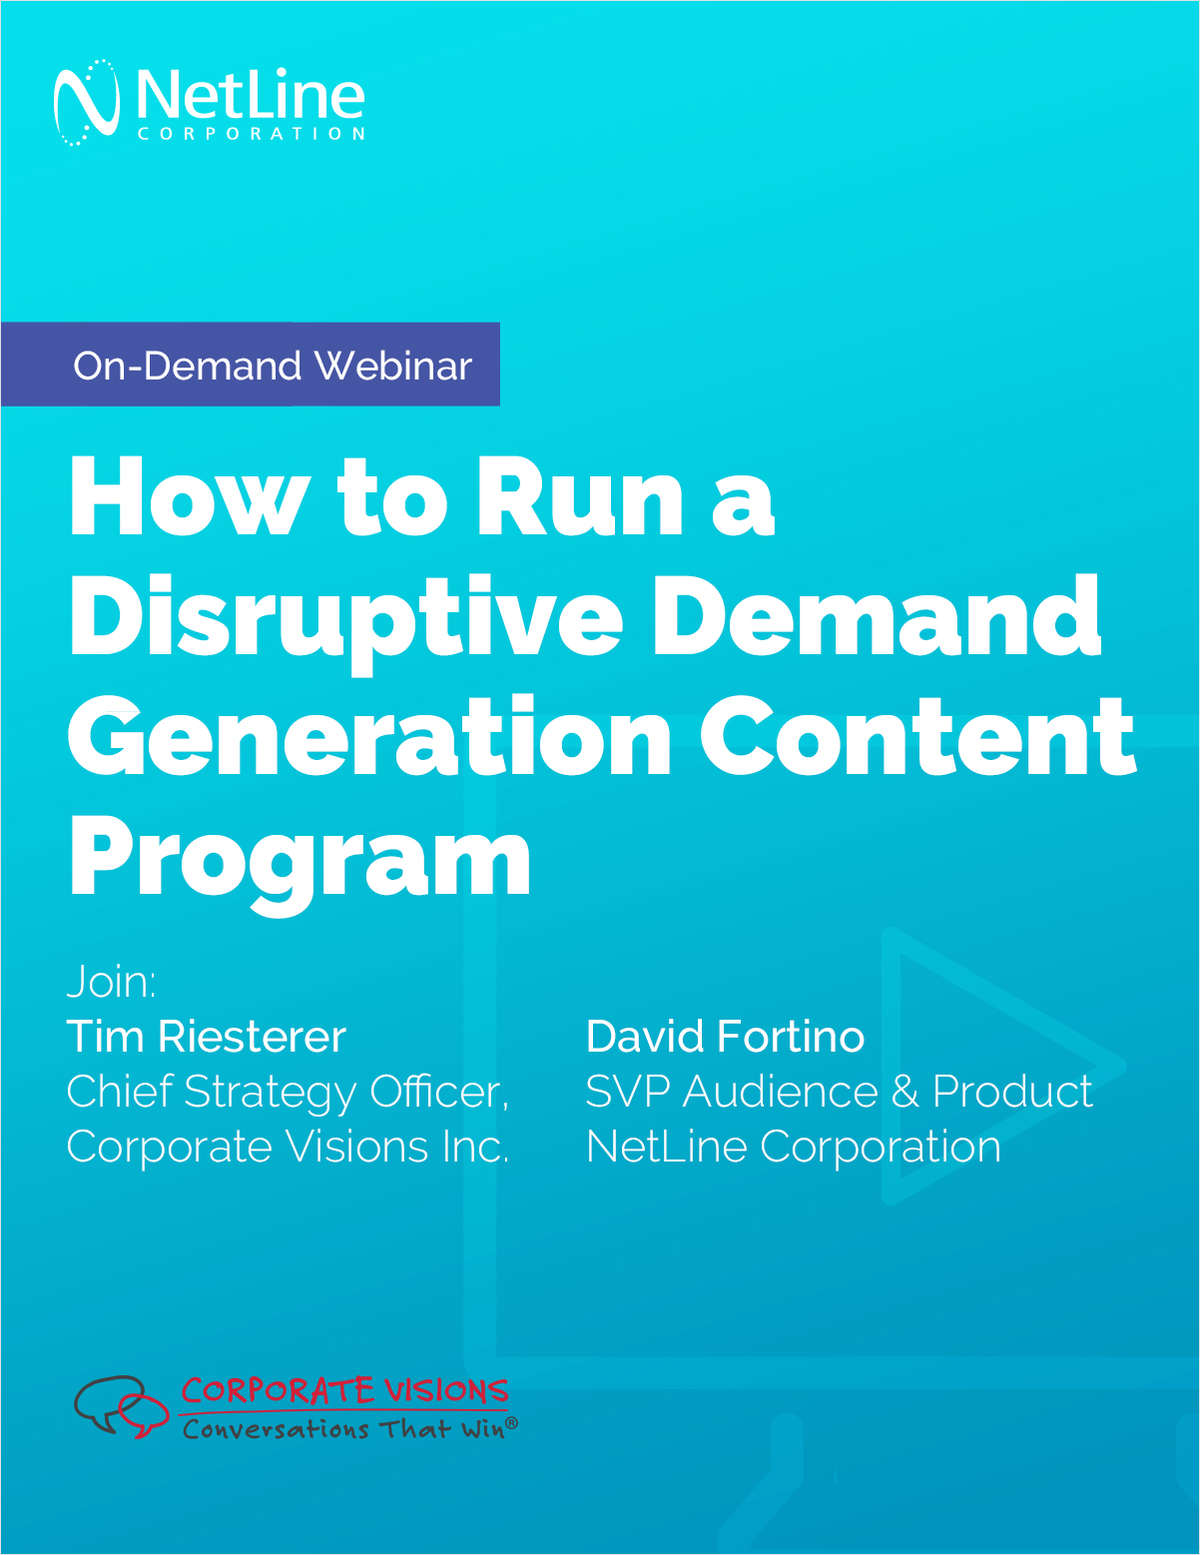 How to Run a Disruptive Demand Generation Content Program